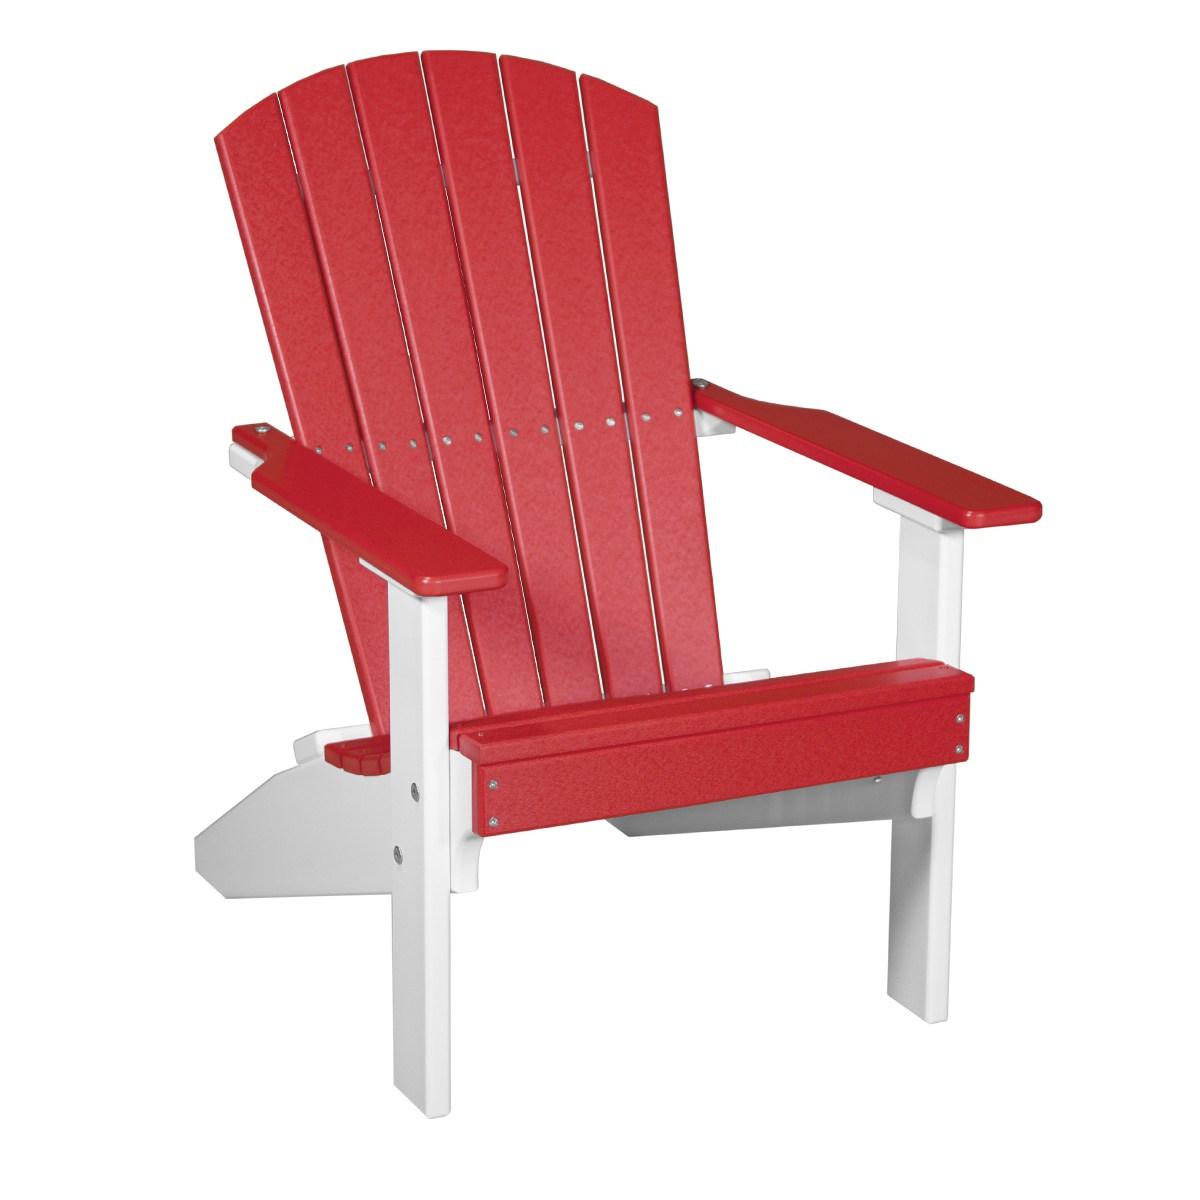 Lakeside Adirondack Chair Recycled Patio